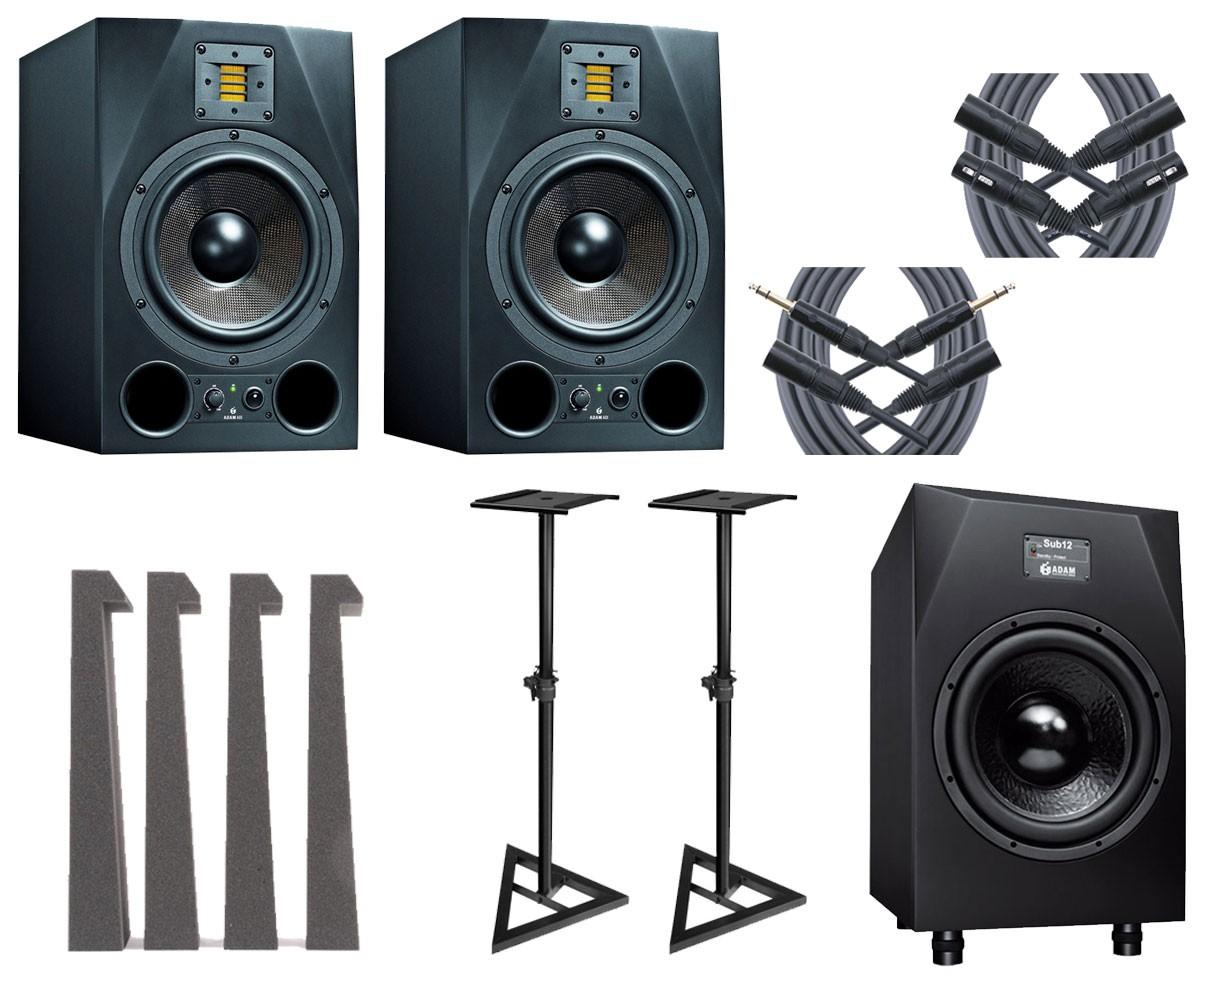 2x ADAM A8X + Sub12 + MoPADs + Stands + Mogami Cables